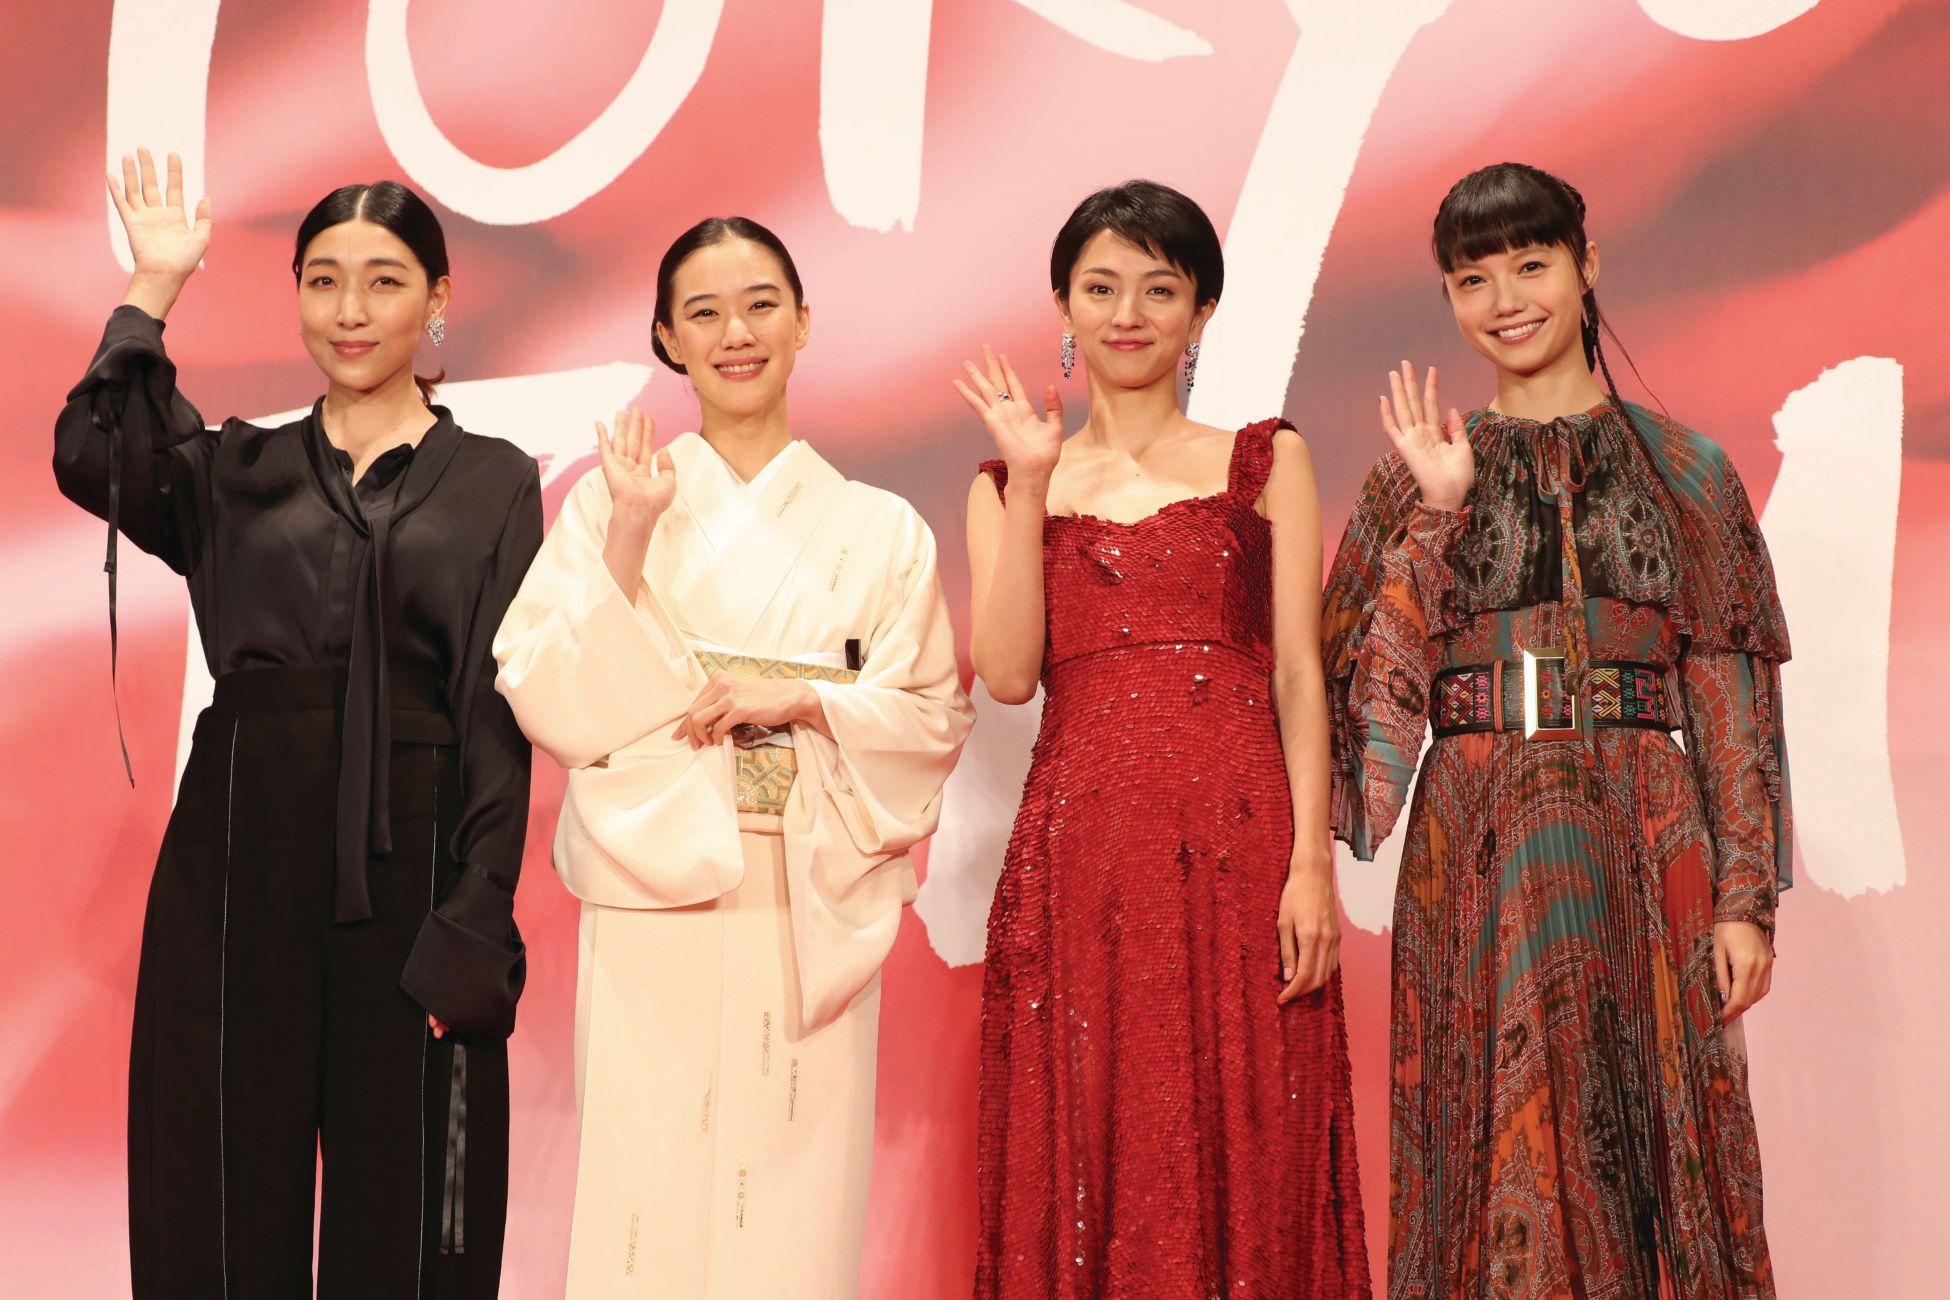 Sakura Ando, Hikari Mitsushima, Yu Aoi ja Aoi Miyazaki (c)2017 TIFF